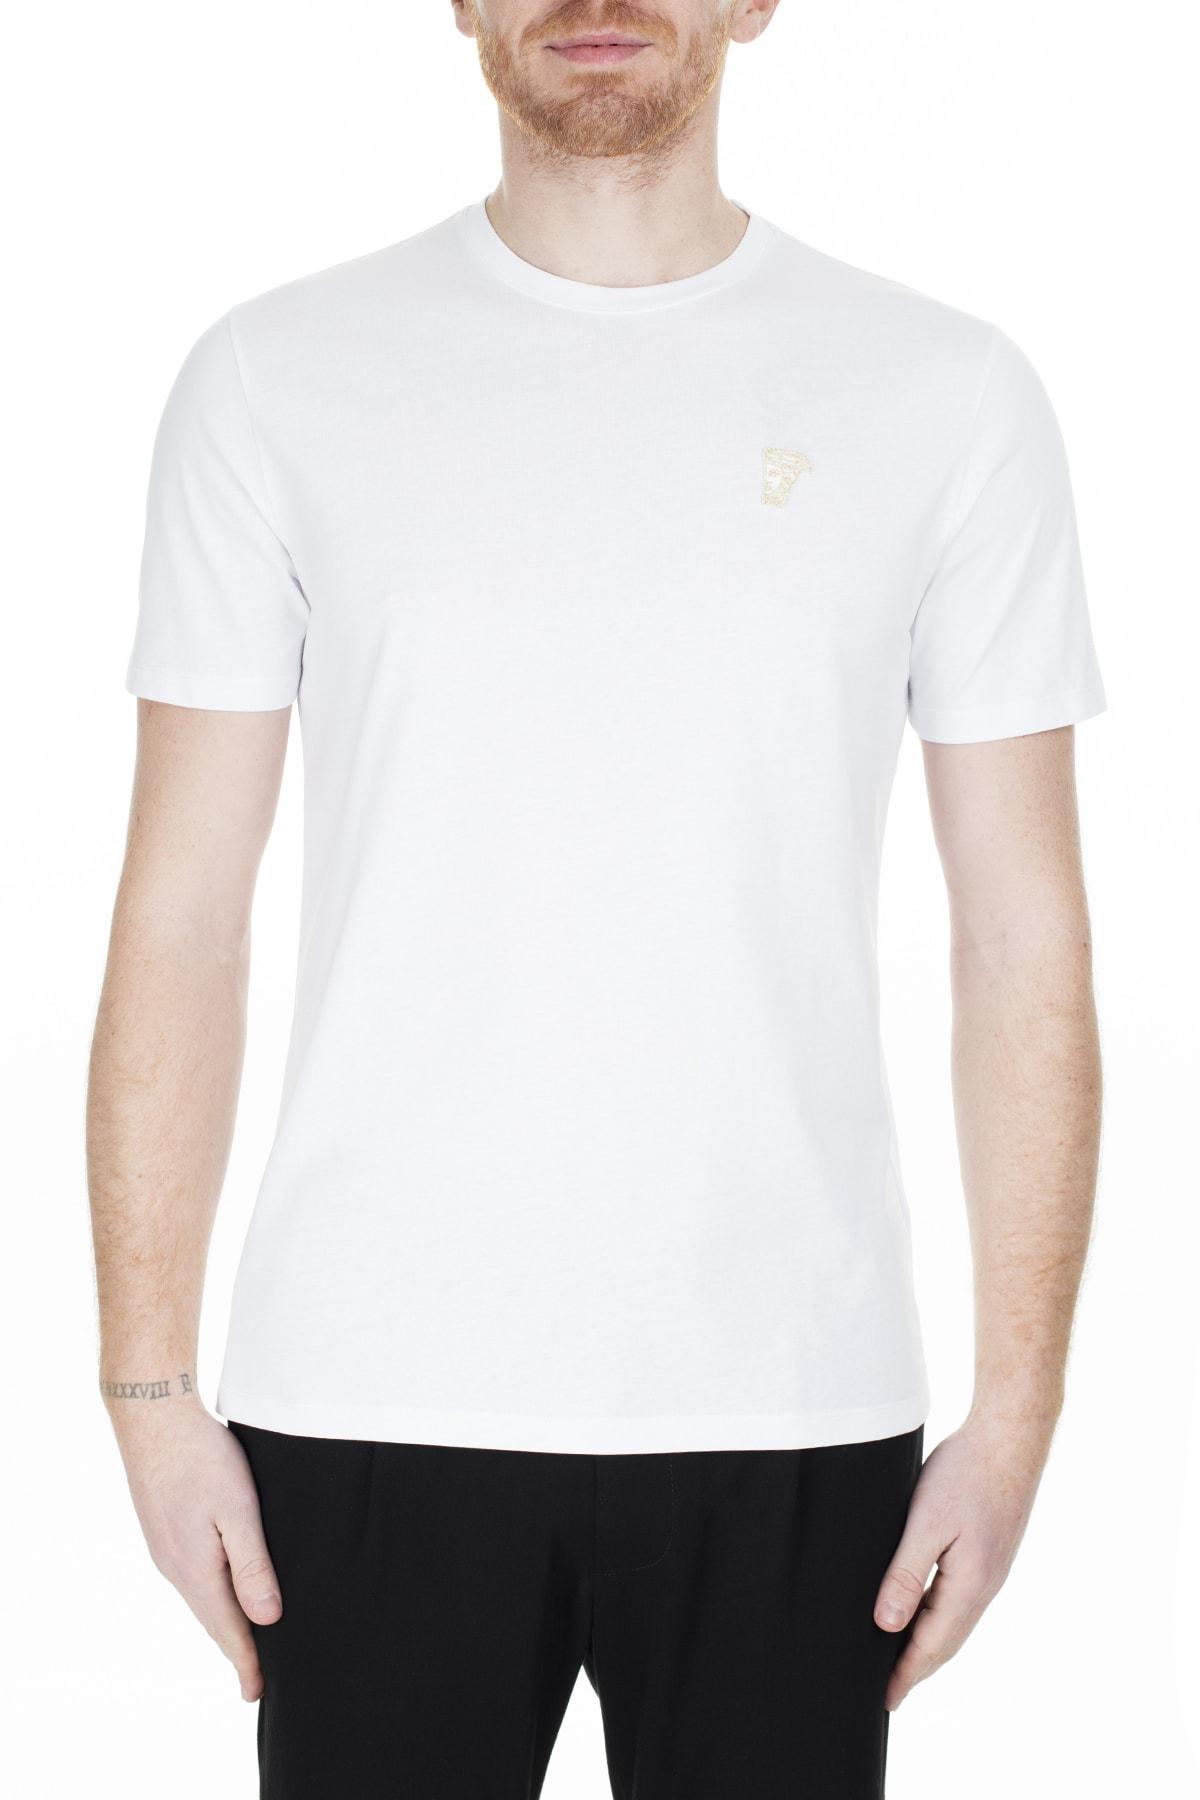 VERSACE COLLECTION Erkek Beyaz T-Shirt V800683R Vj00180 V9052